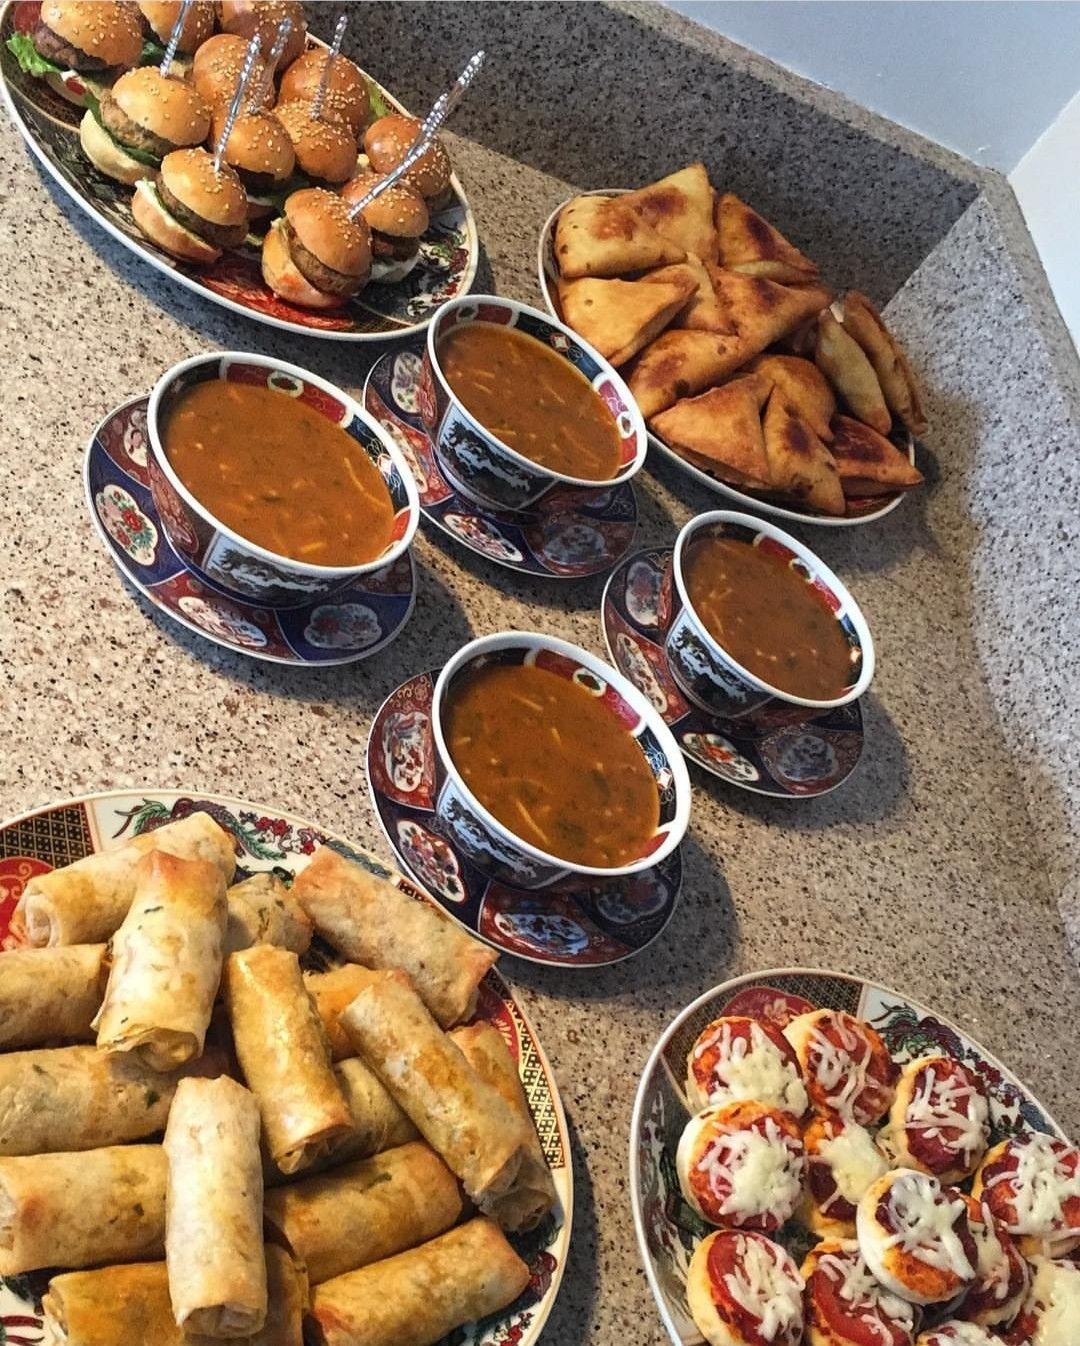 Image De Plat De Cuisine plat de ramadan | morrocan food, moroccan food, moroccan cooking